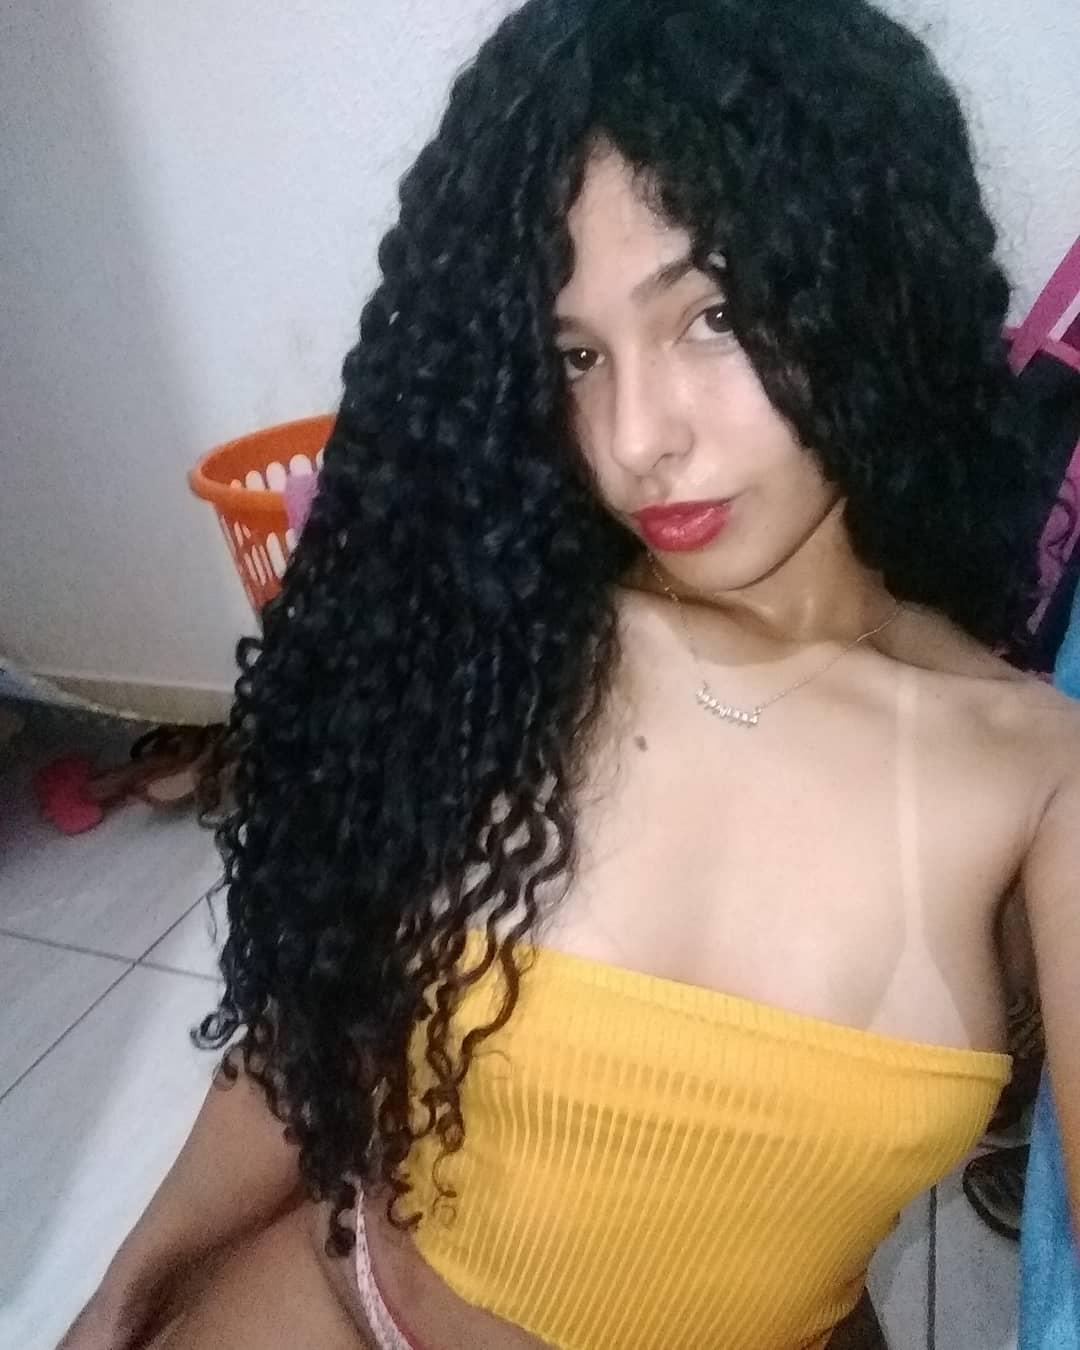 Mirian Gabriela Pagando Boquete